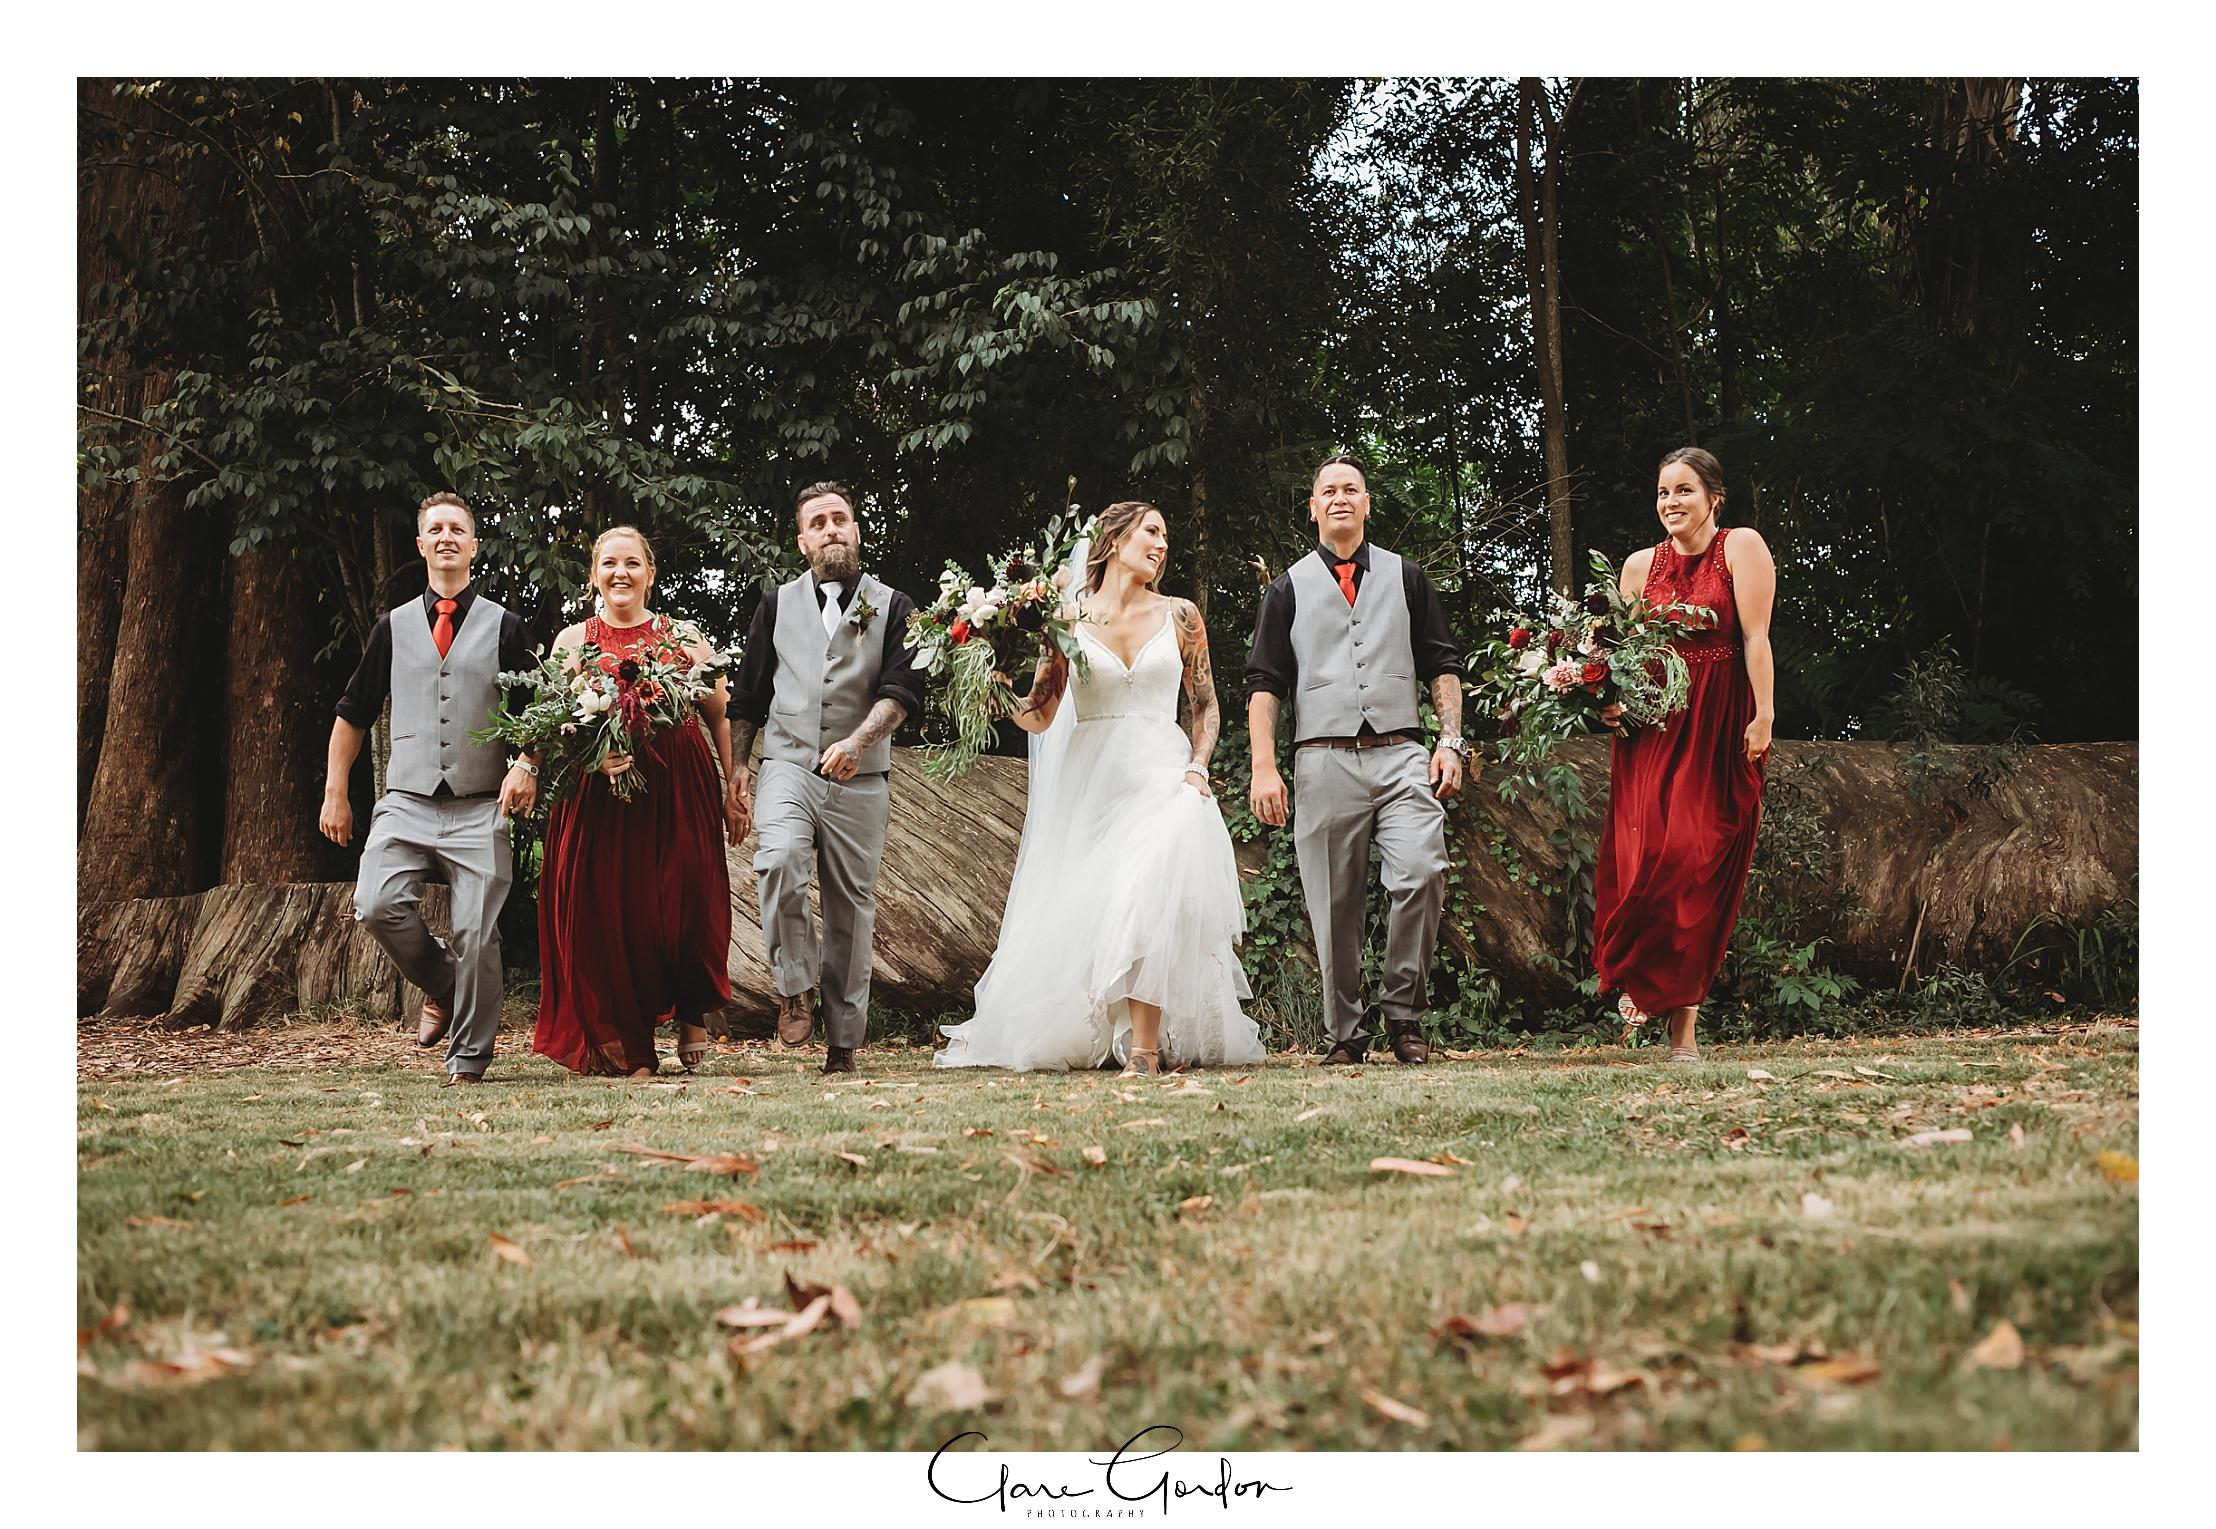 Waikato-wedding-photographer-Forest-weddnig-Hamilton-wedding-Newzealand (81).jpg